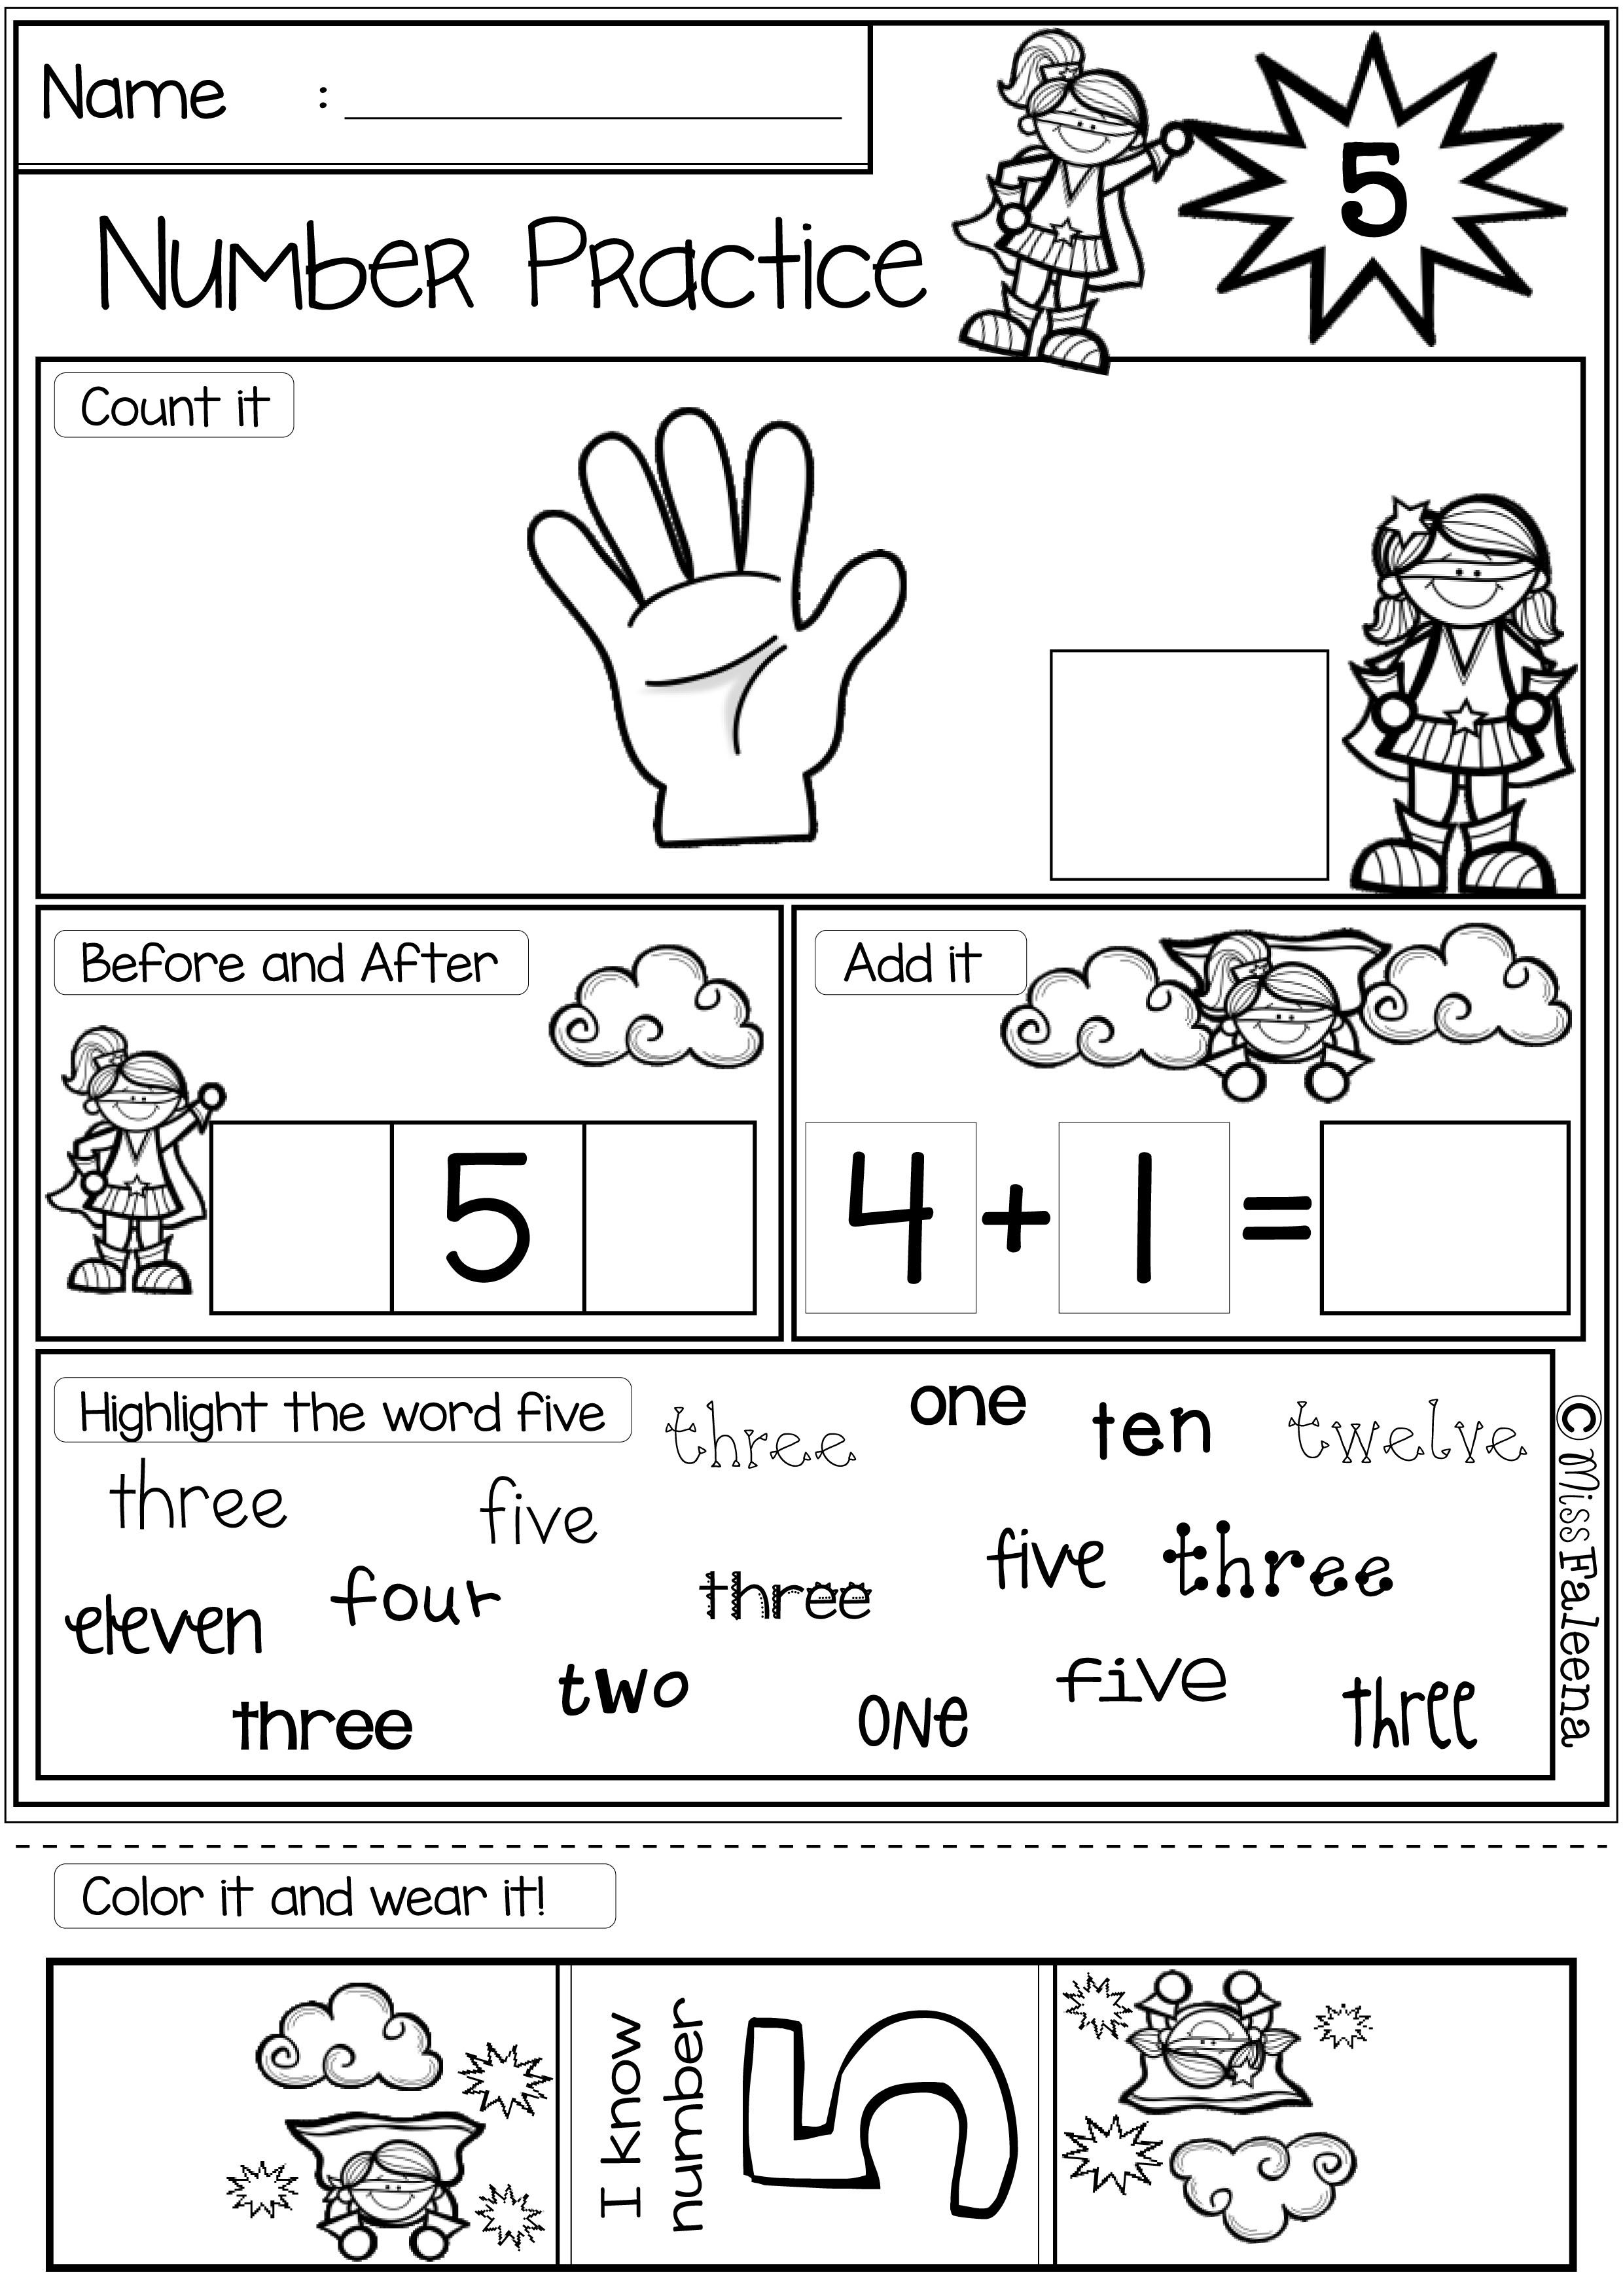 Free Number Practice